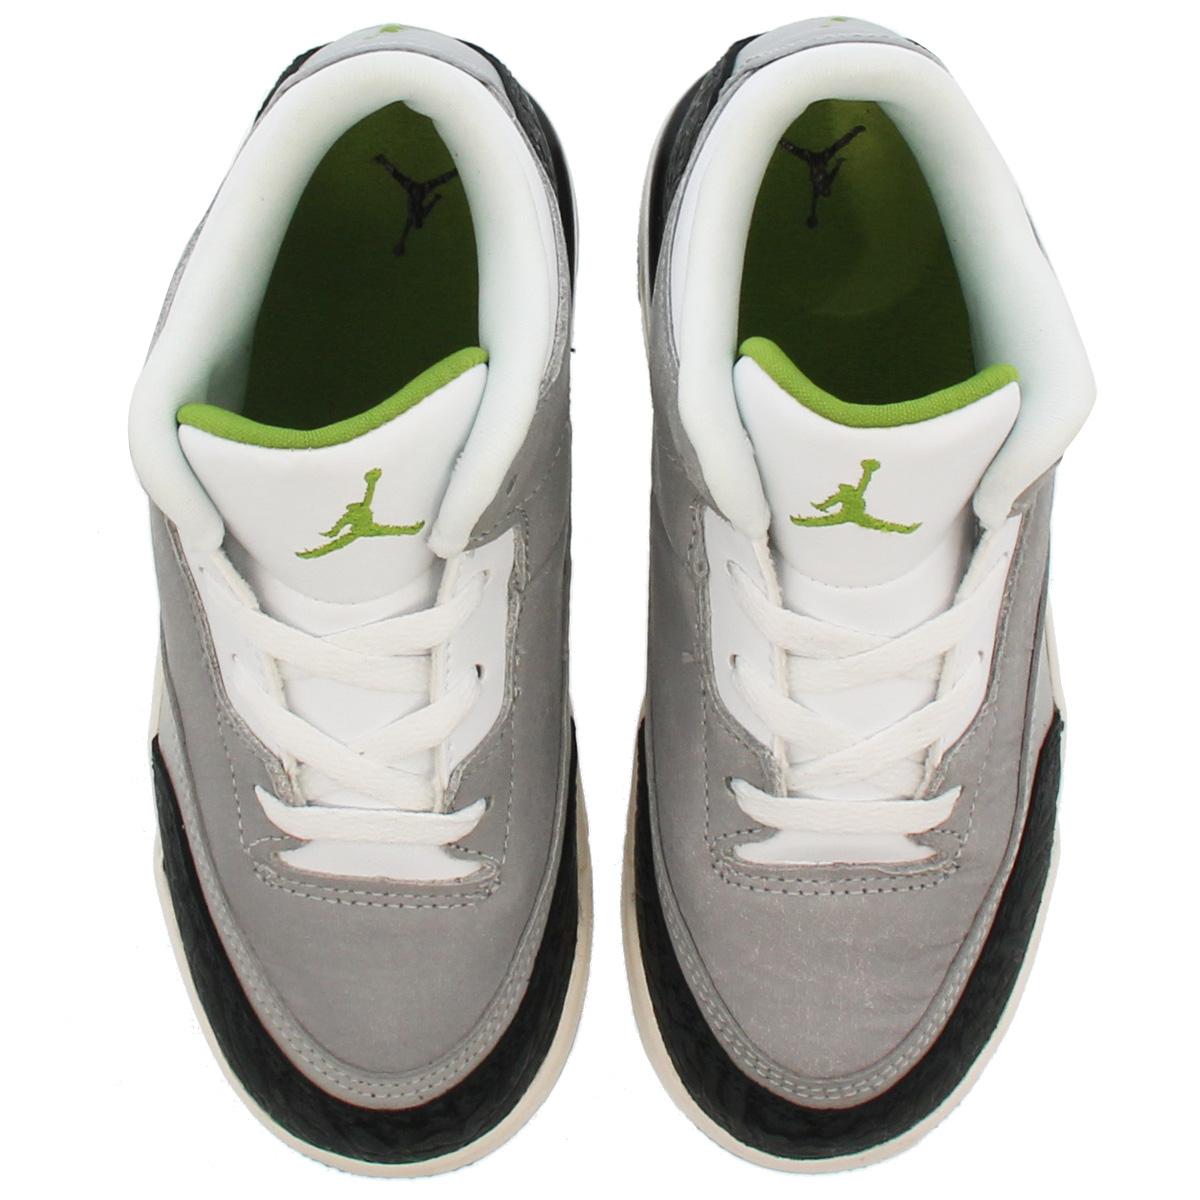 b3372d17d04 NIKE AIR JORDAN 3 RETRO BT Nike Air Jordan 3 nostalgic BT LIGHT SMOKE GREY  CHLOROPHYLL BLACK WHITE 832